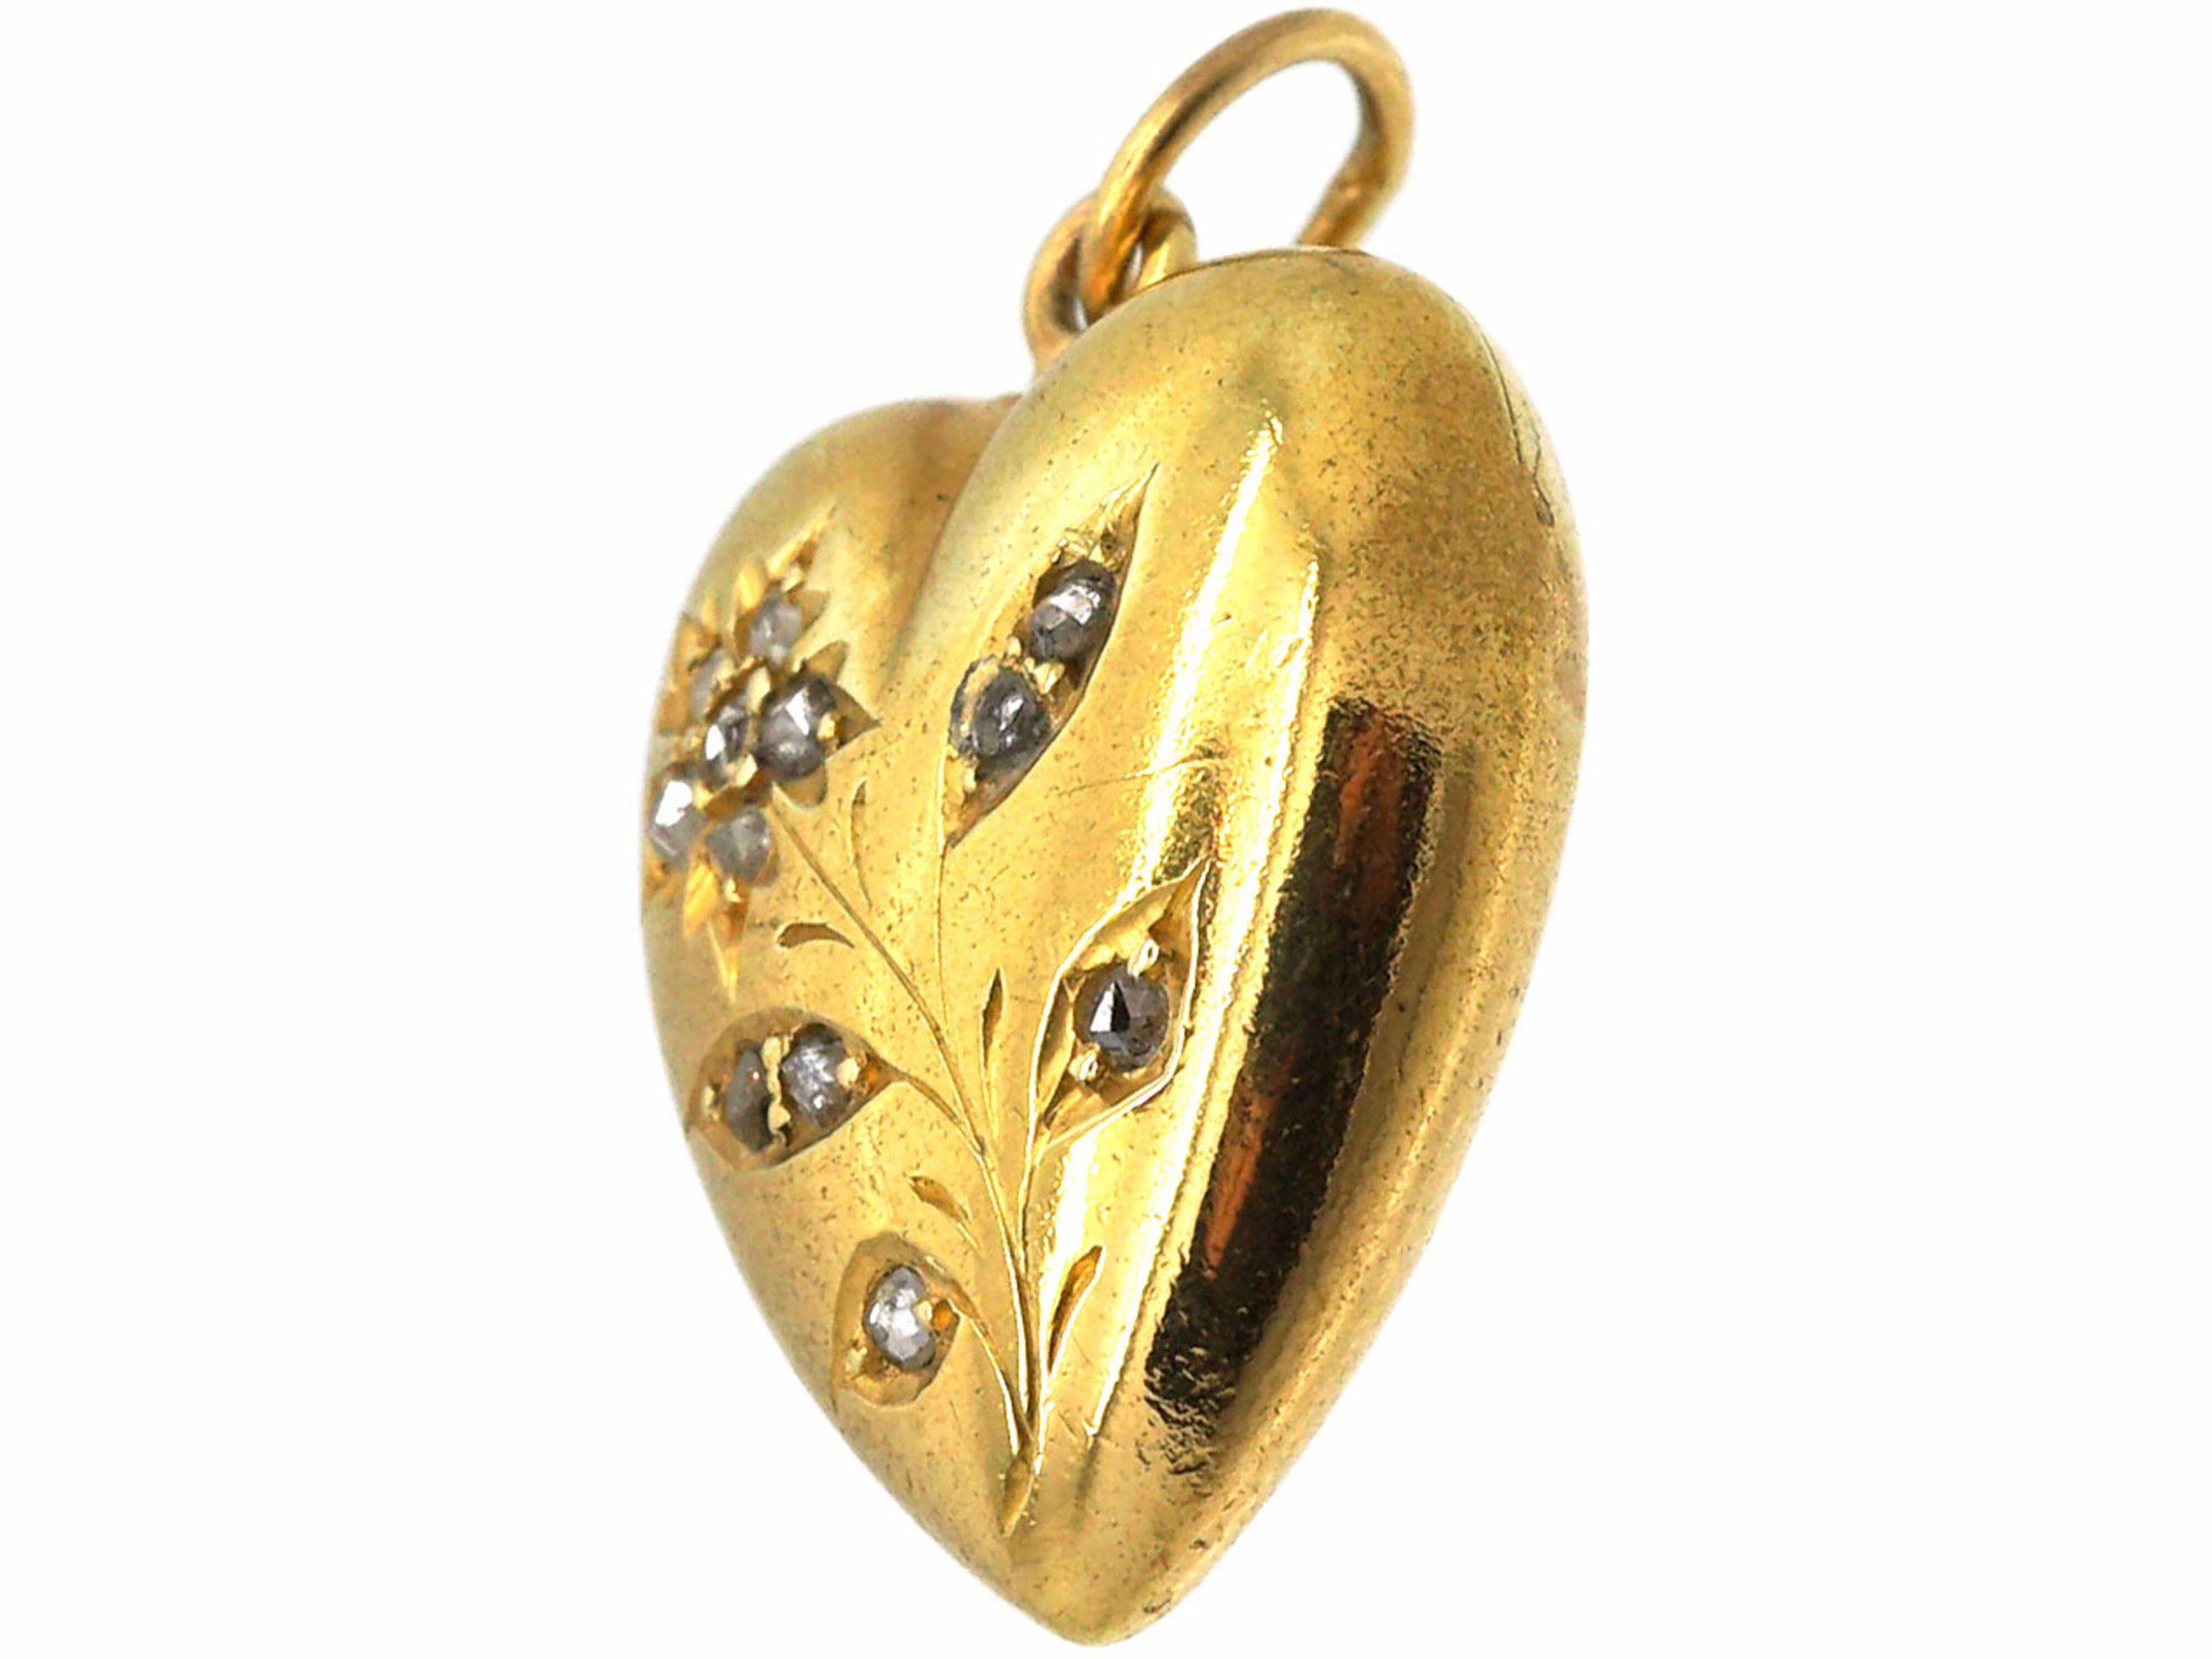 Edwardian 15ct Gold Heart Shaped Pendant with Rose Diamond Set Flower Motif